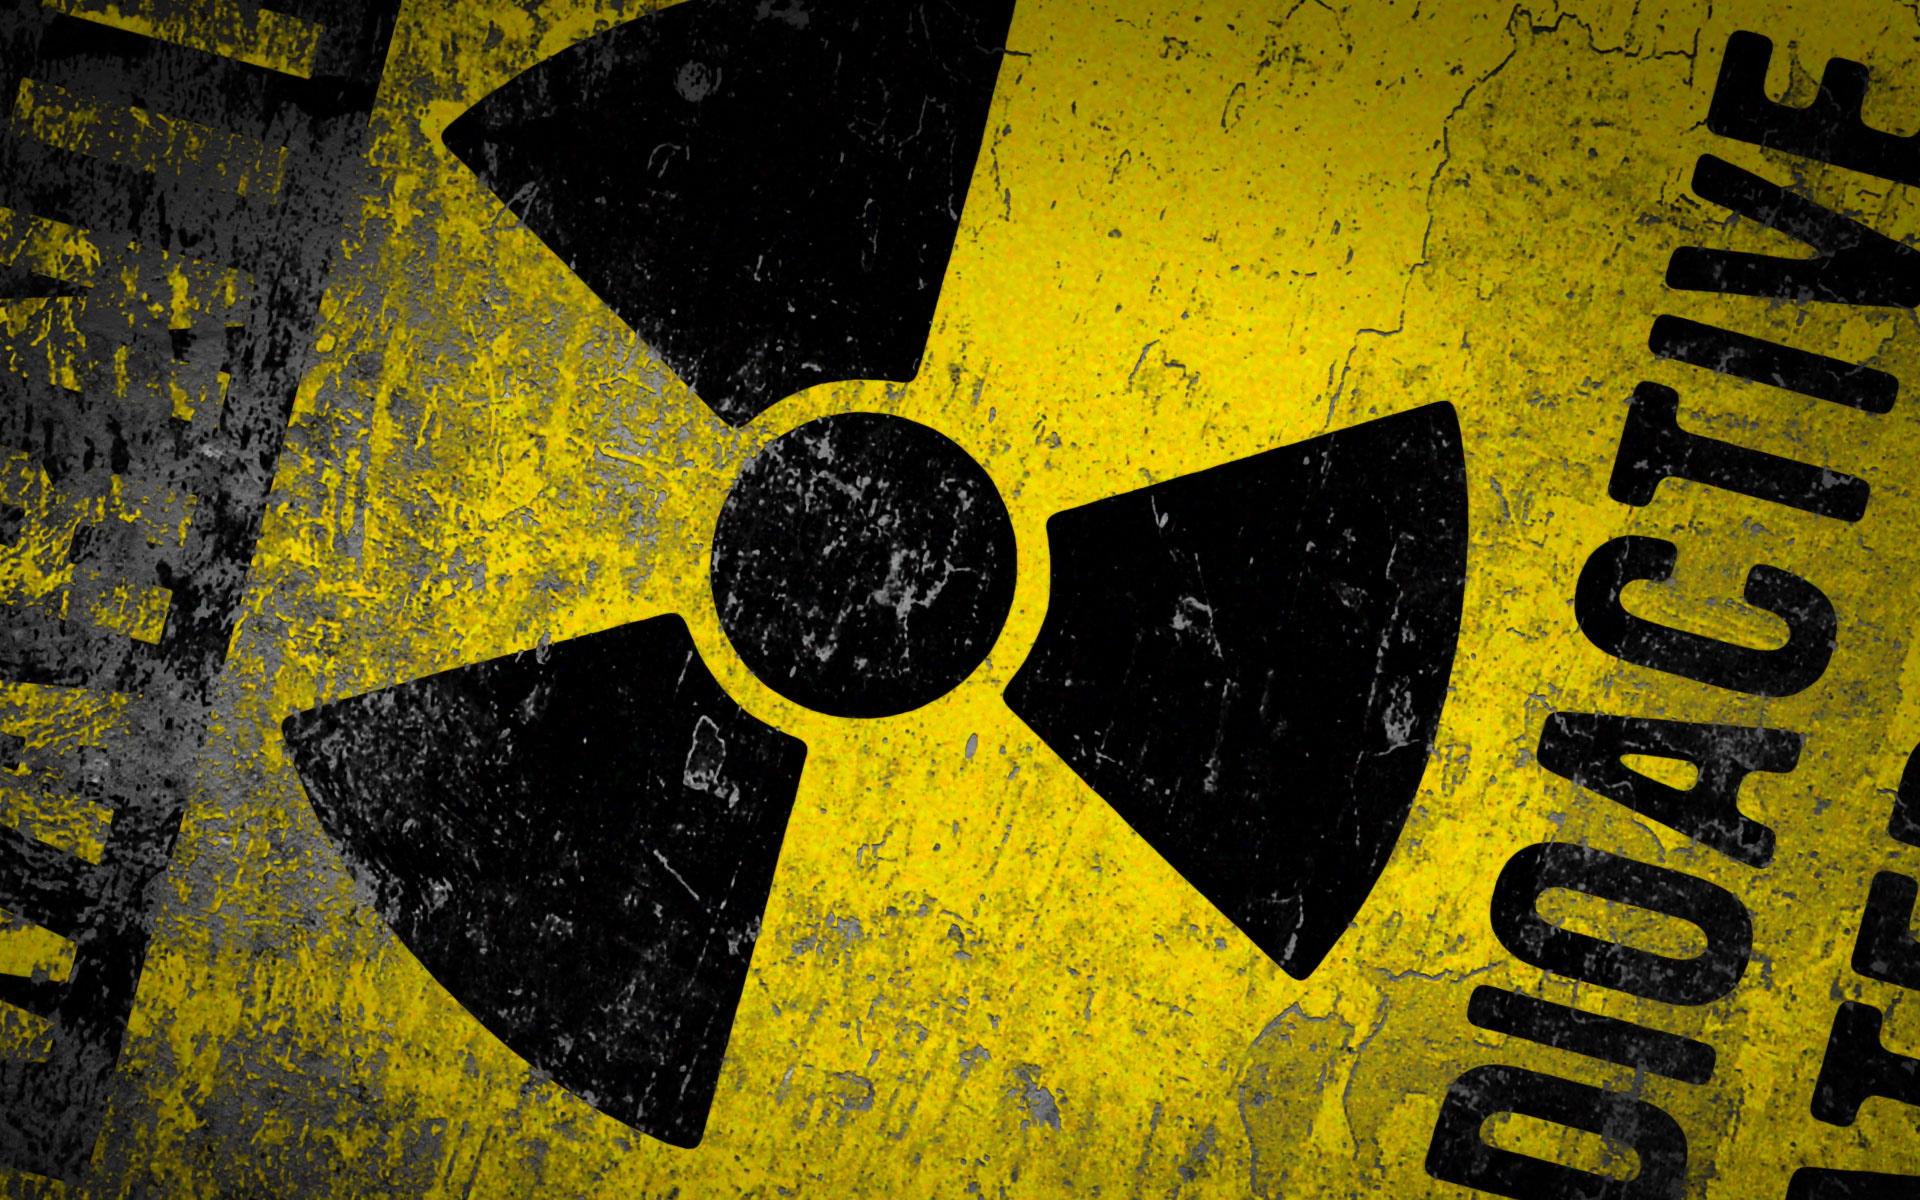 Danger Radioactive Sign 1920x1200